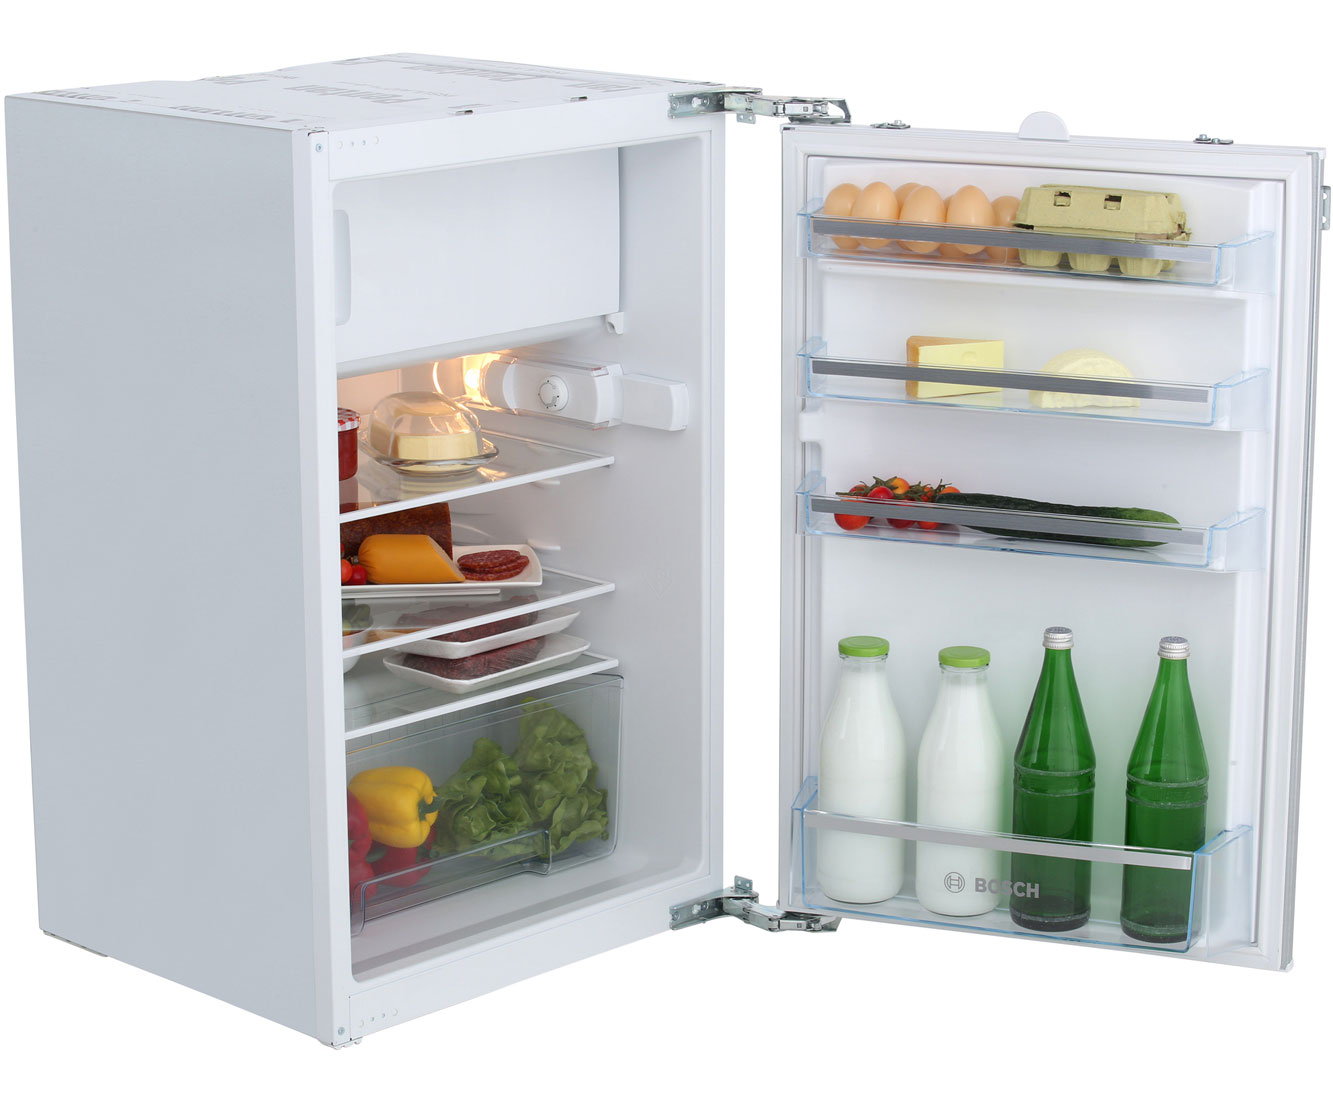 Bosch Kühlschrank Vergleich : Bosch kil v serie kühlschrank eingebaut cm weiss neu ebay